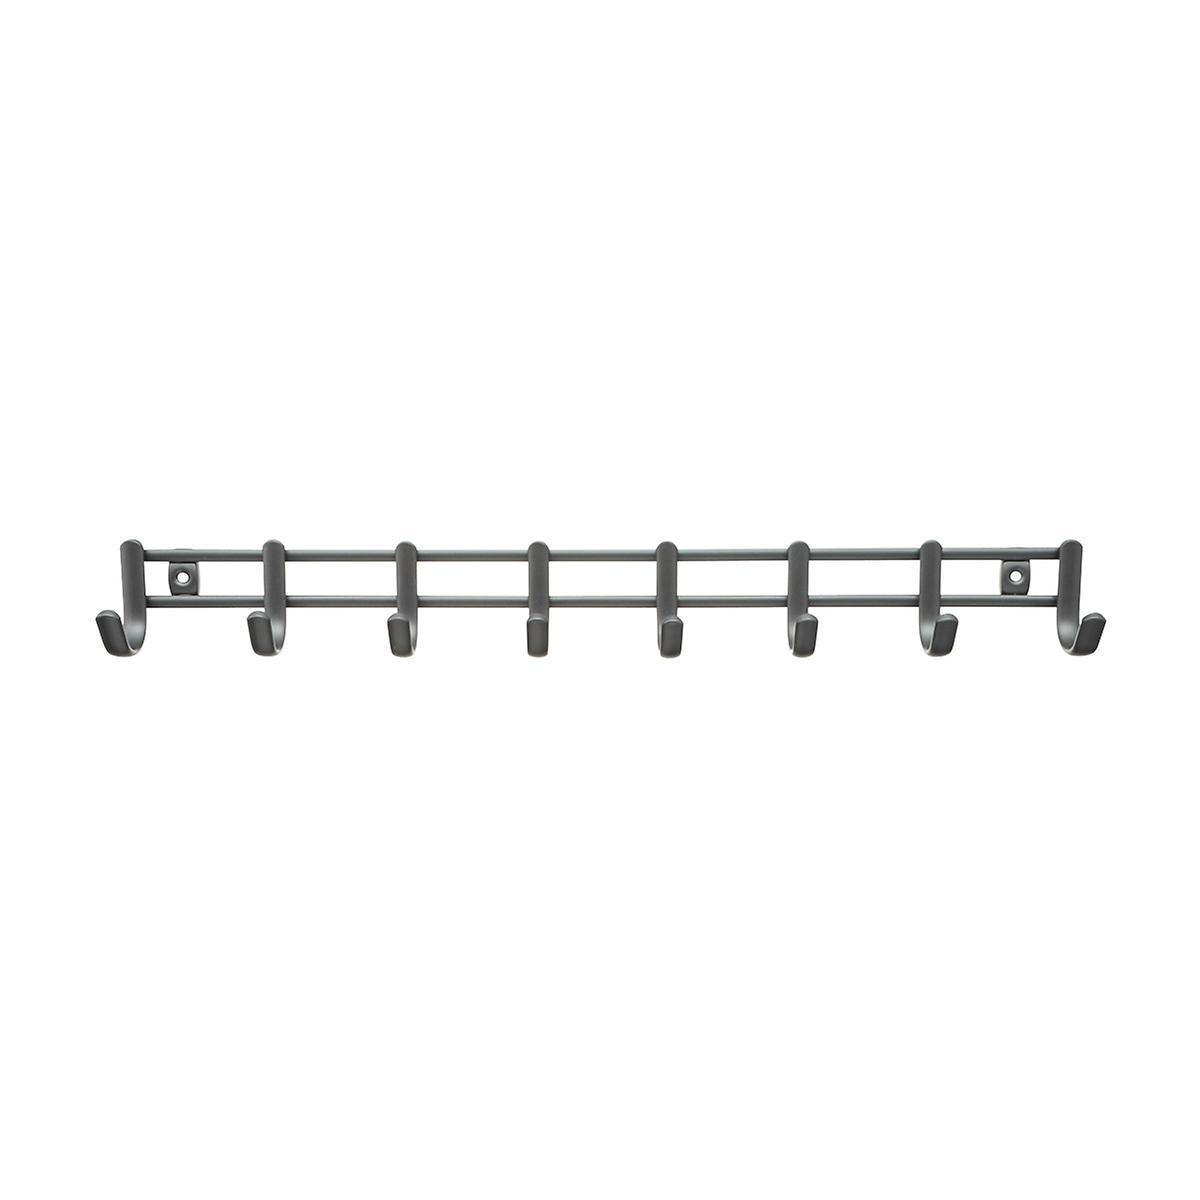 InterDesign Axis Graphite Horizontal Tie & Belt Rack